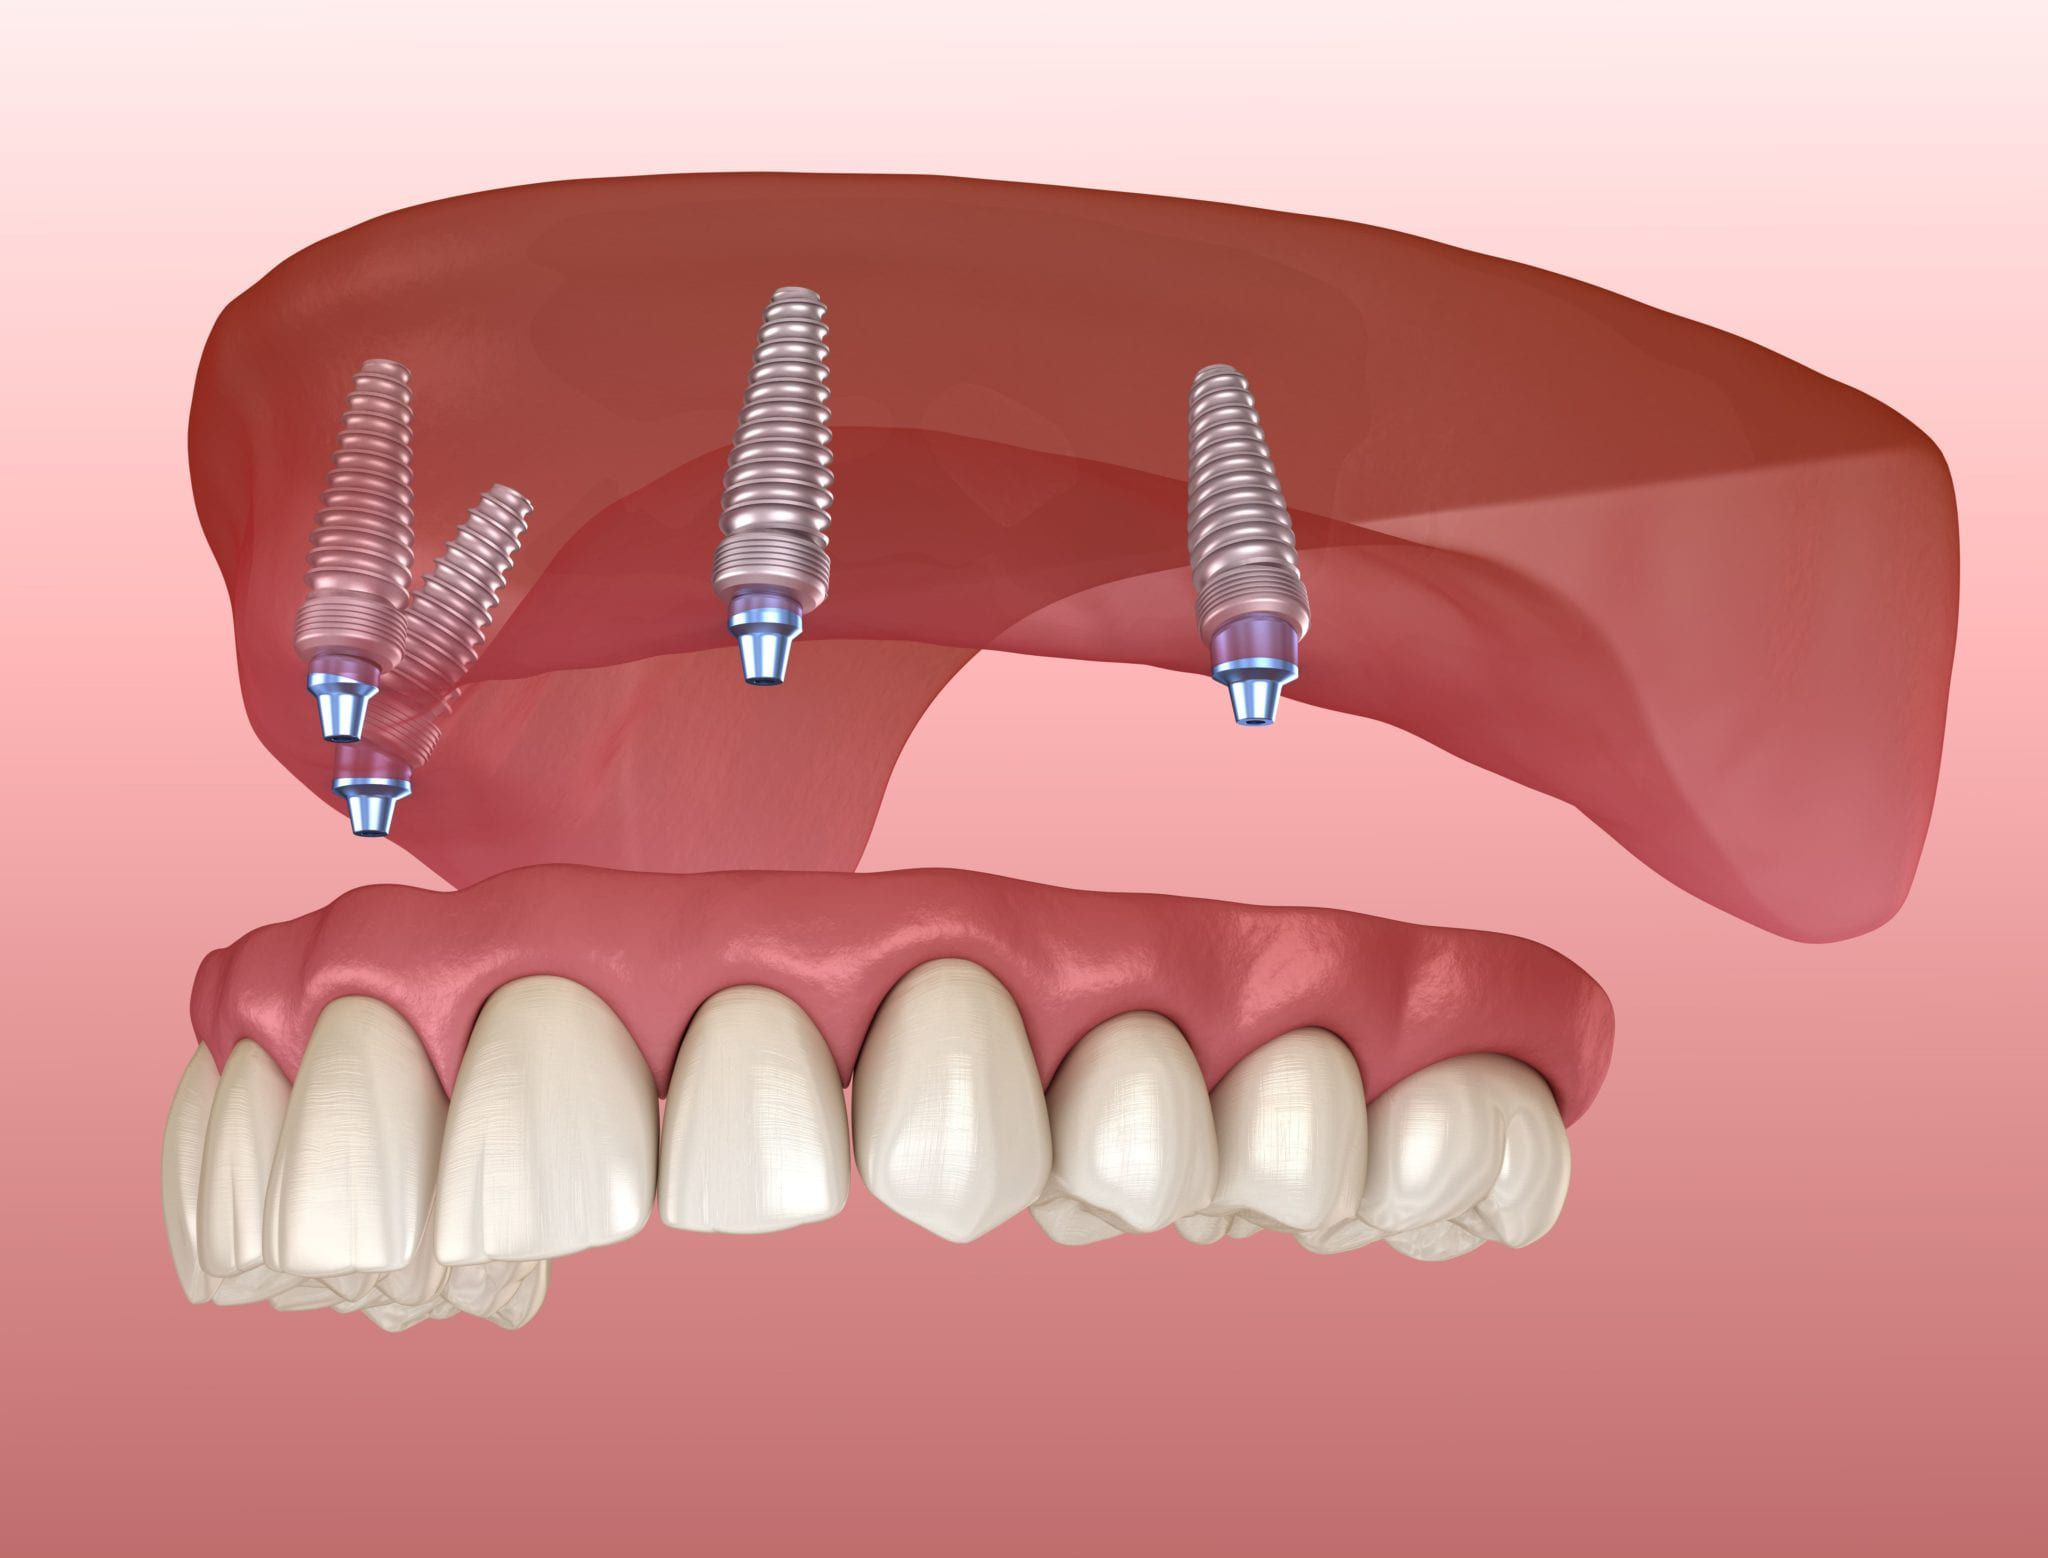 Dental Implants & Implant Fixed Dentures - Tulsa Precision Dental